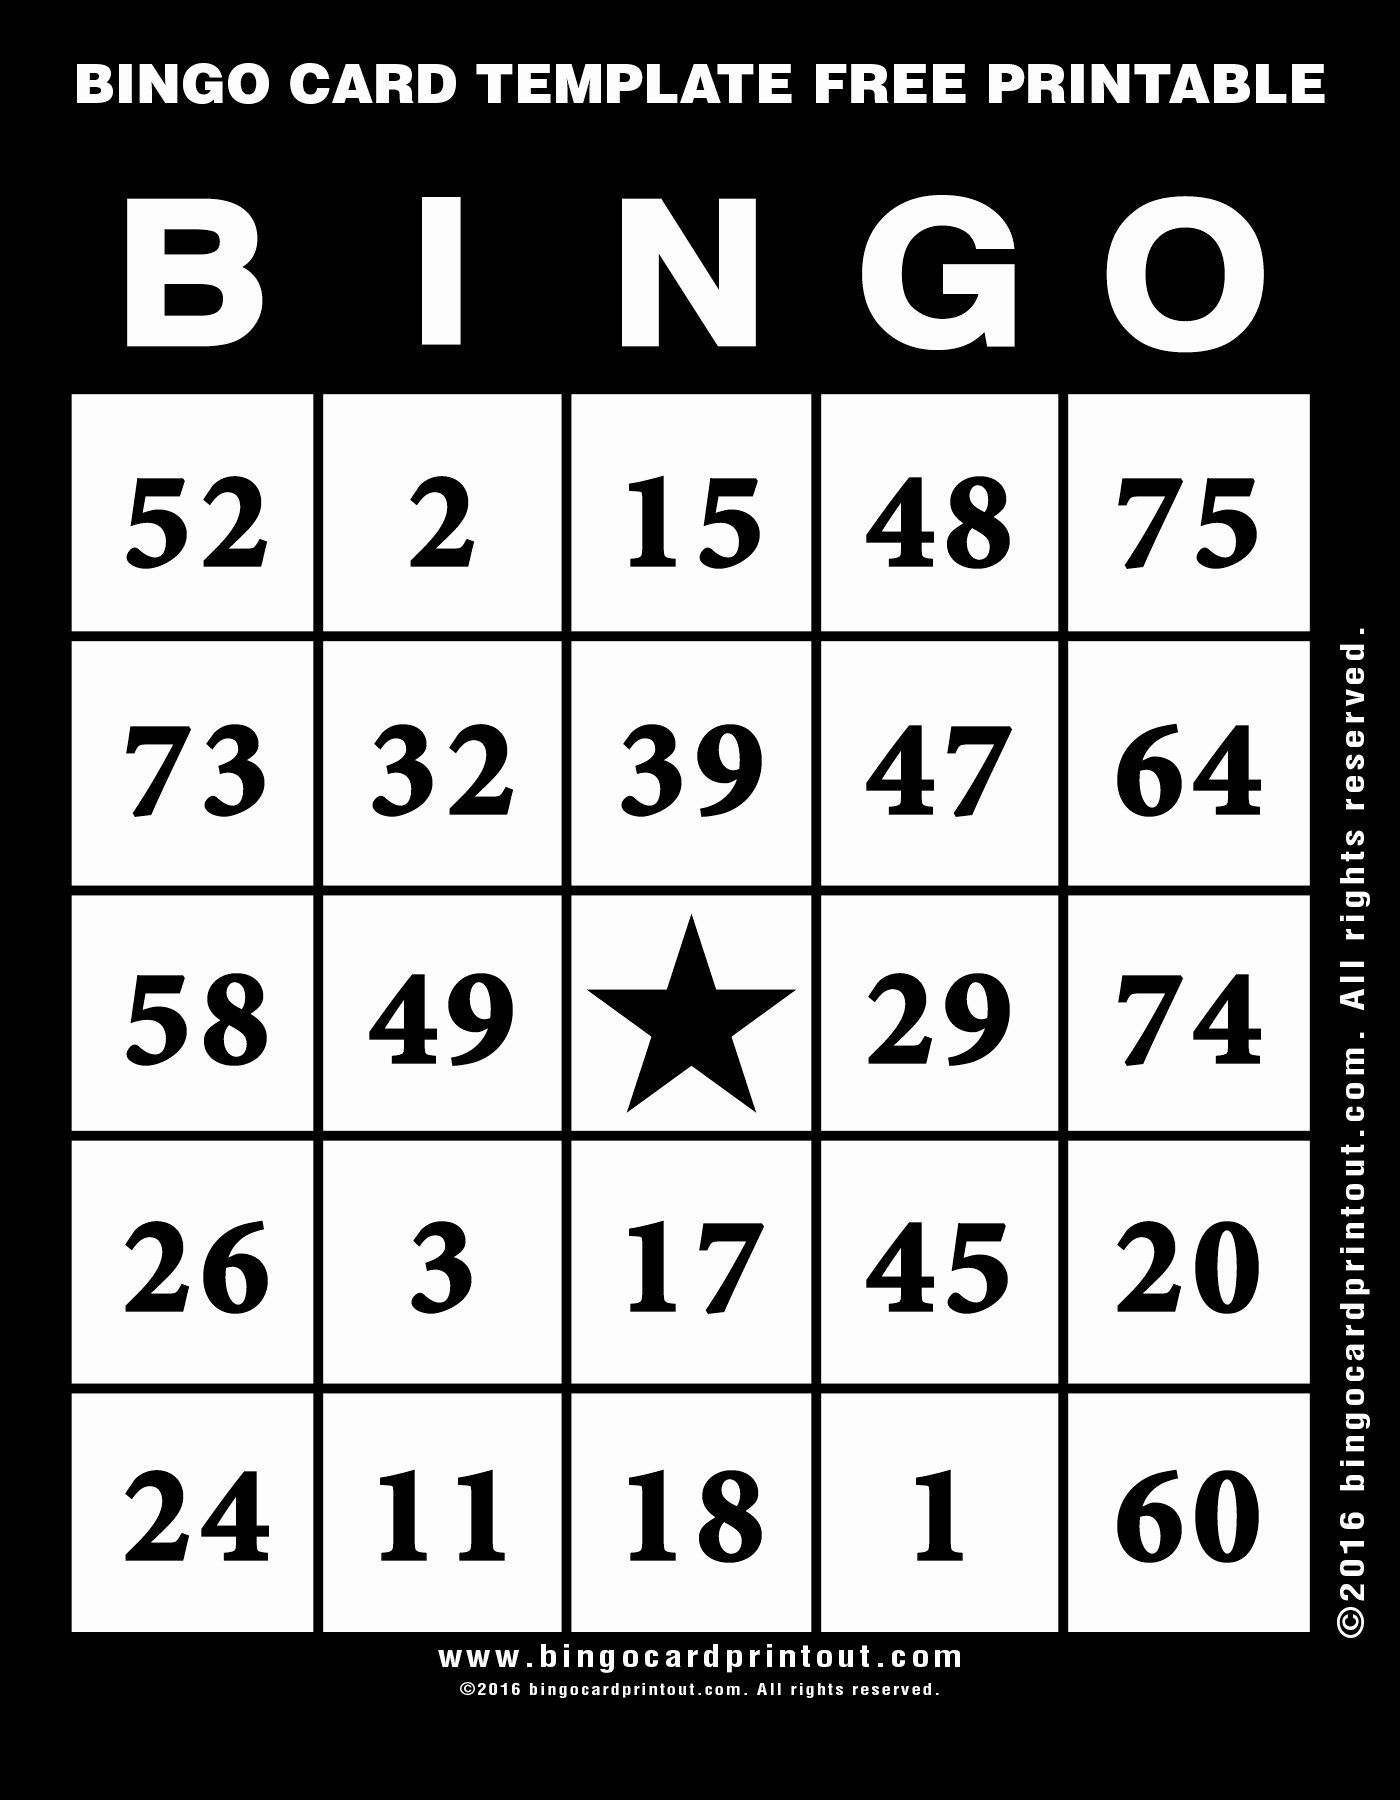 Free Printable Postcard Template Fresh Bingo Card Template Free Printable Bingocardprintout